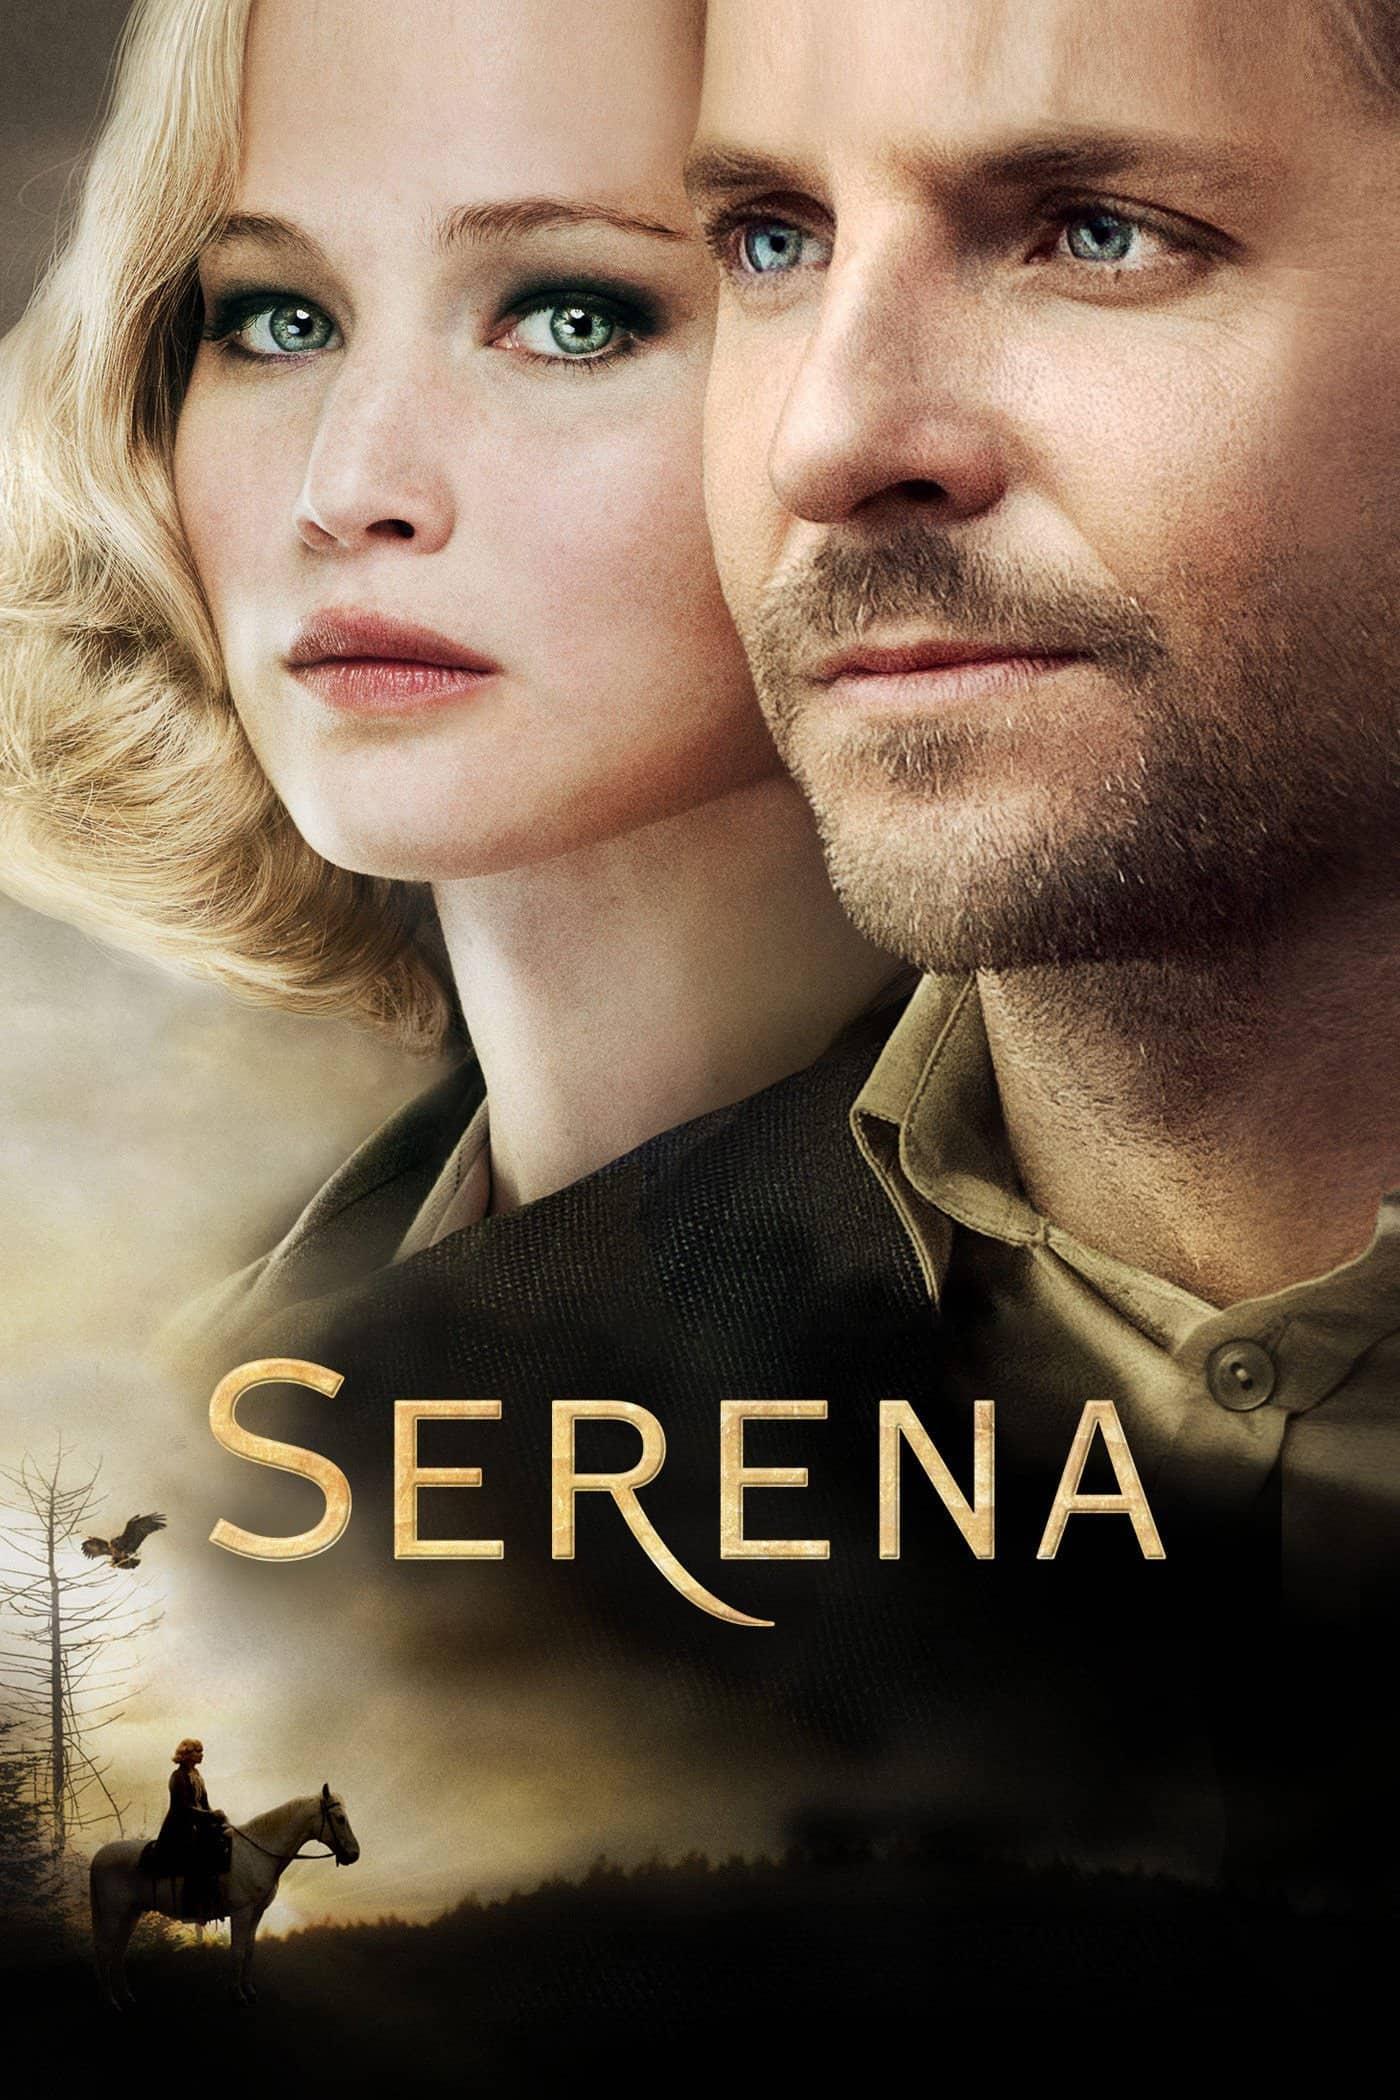 Serena, 2014